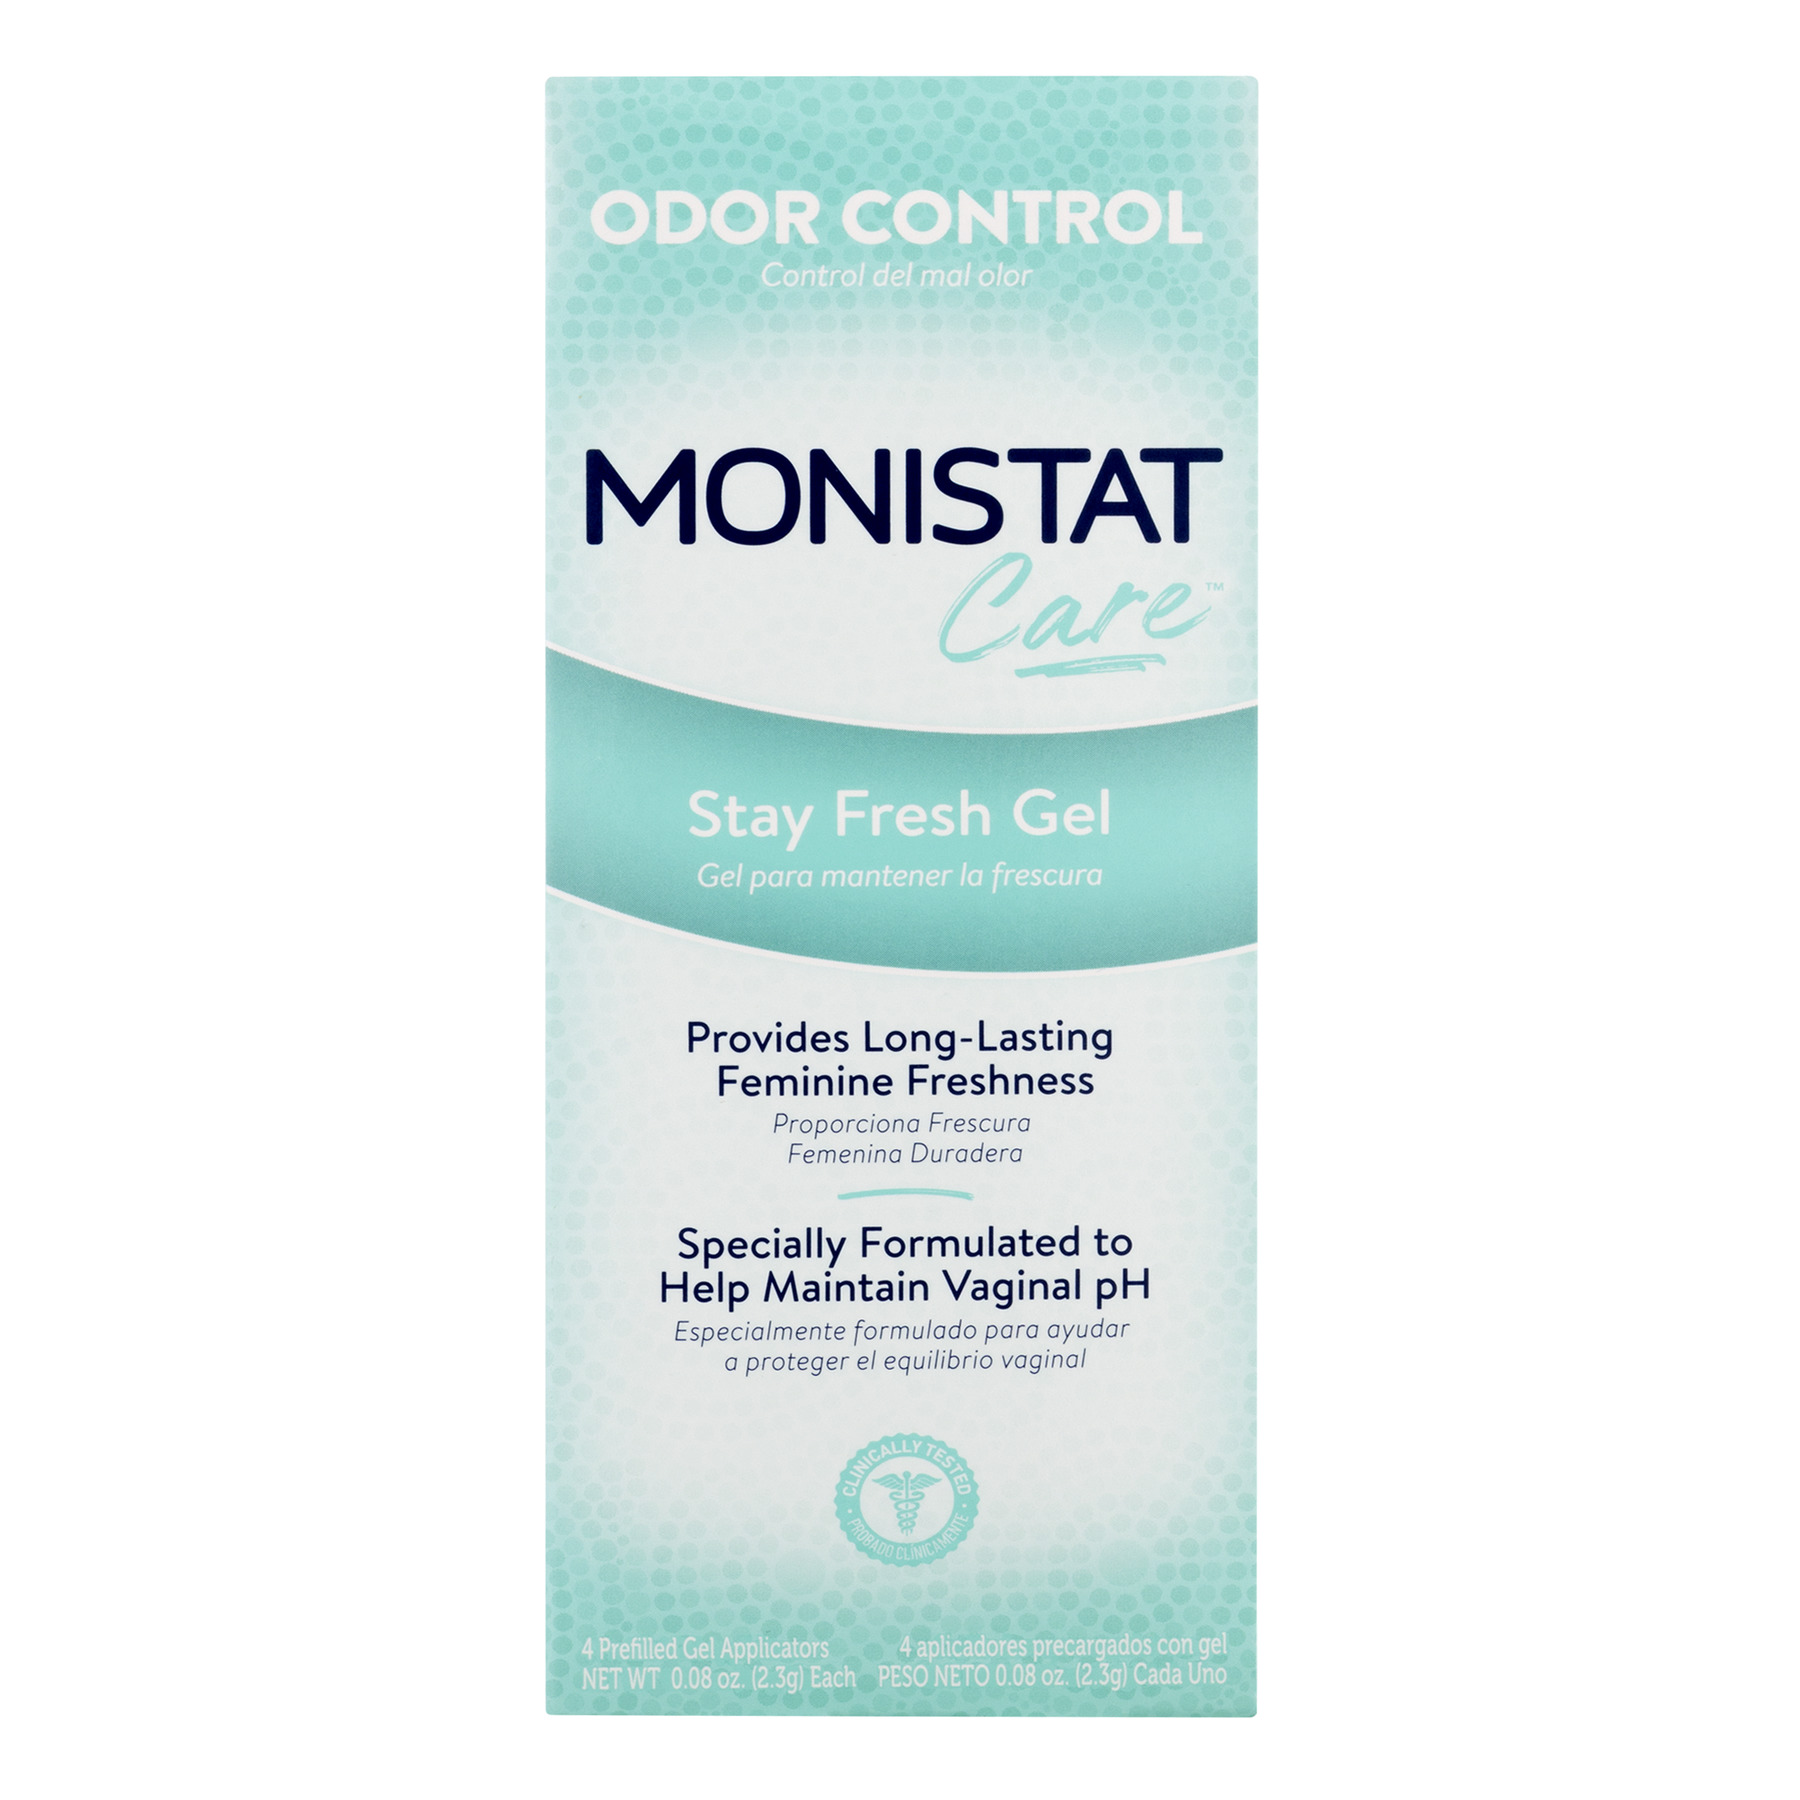 Monistat Care Stay Fresh Gel | 4 Pre-filled Applicators | Odor Control